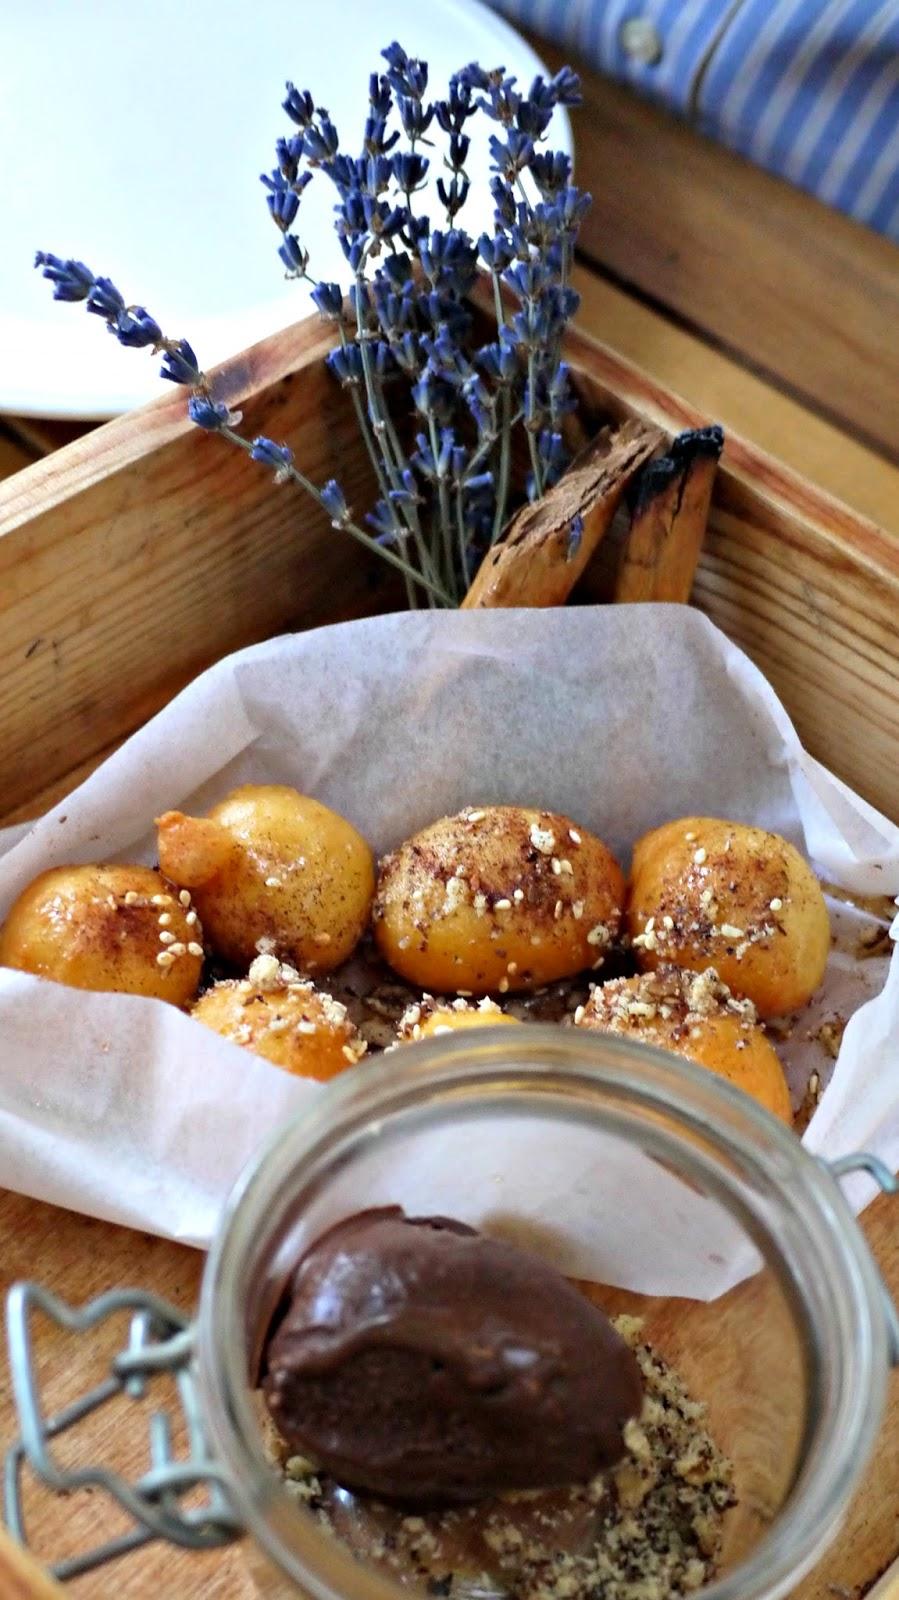 Mazi Loukoumades, lavender honey, and chocolate sorbet